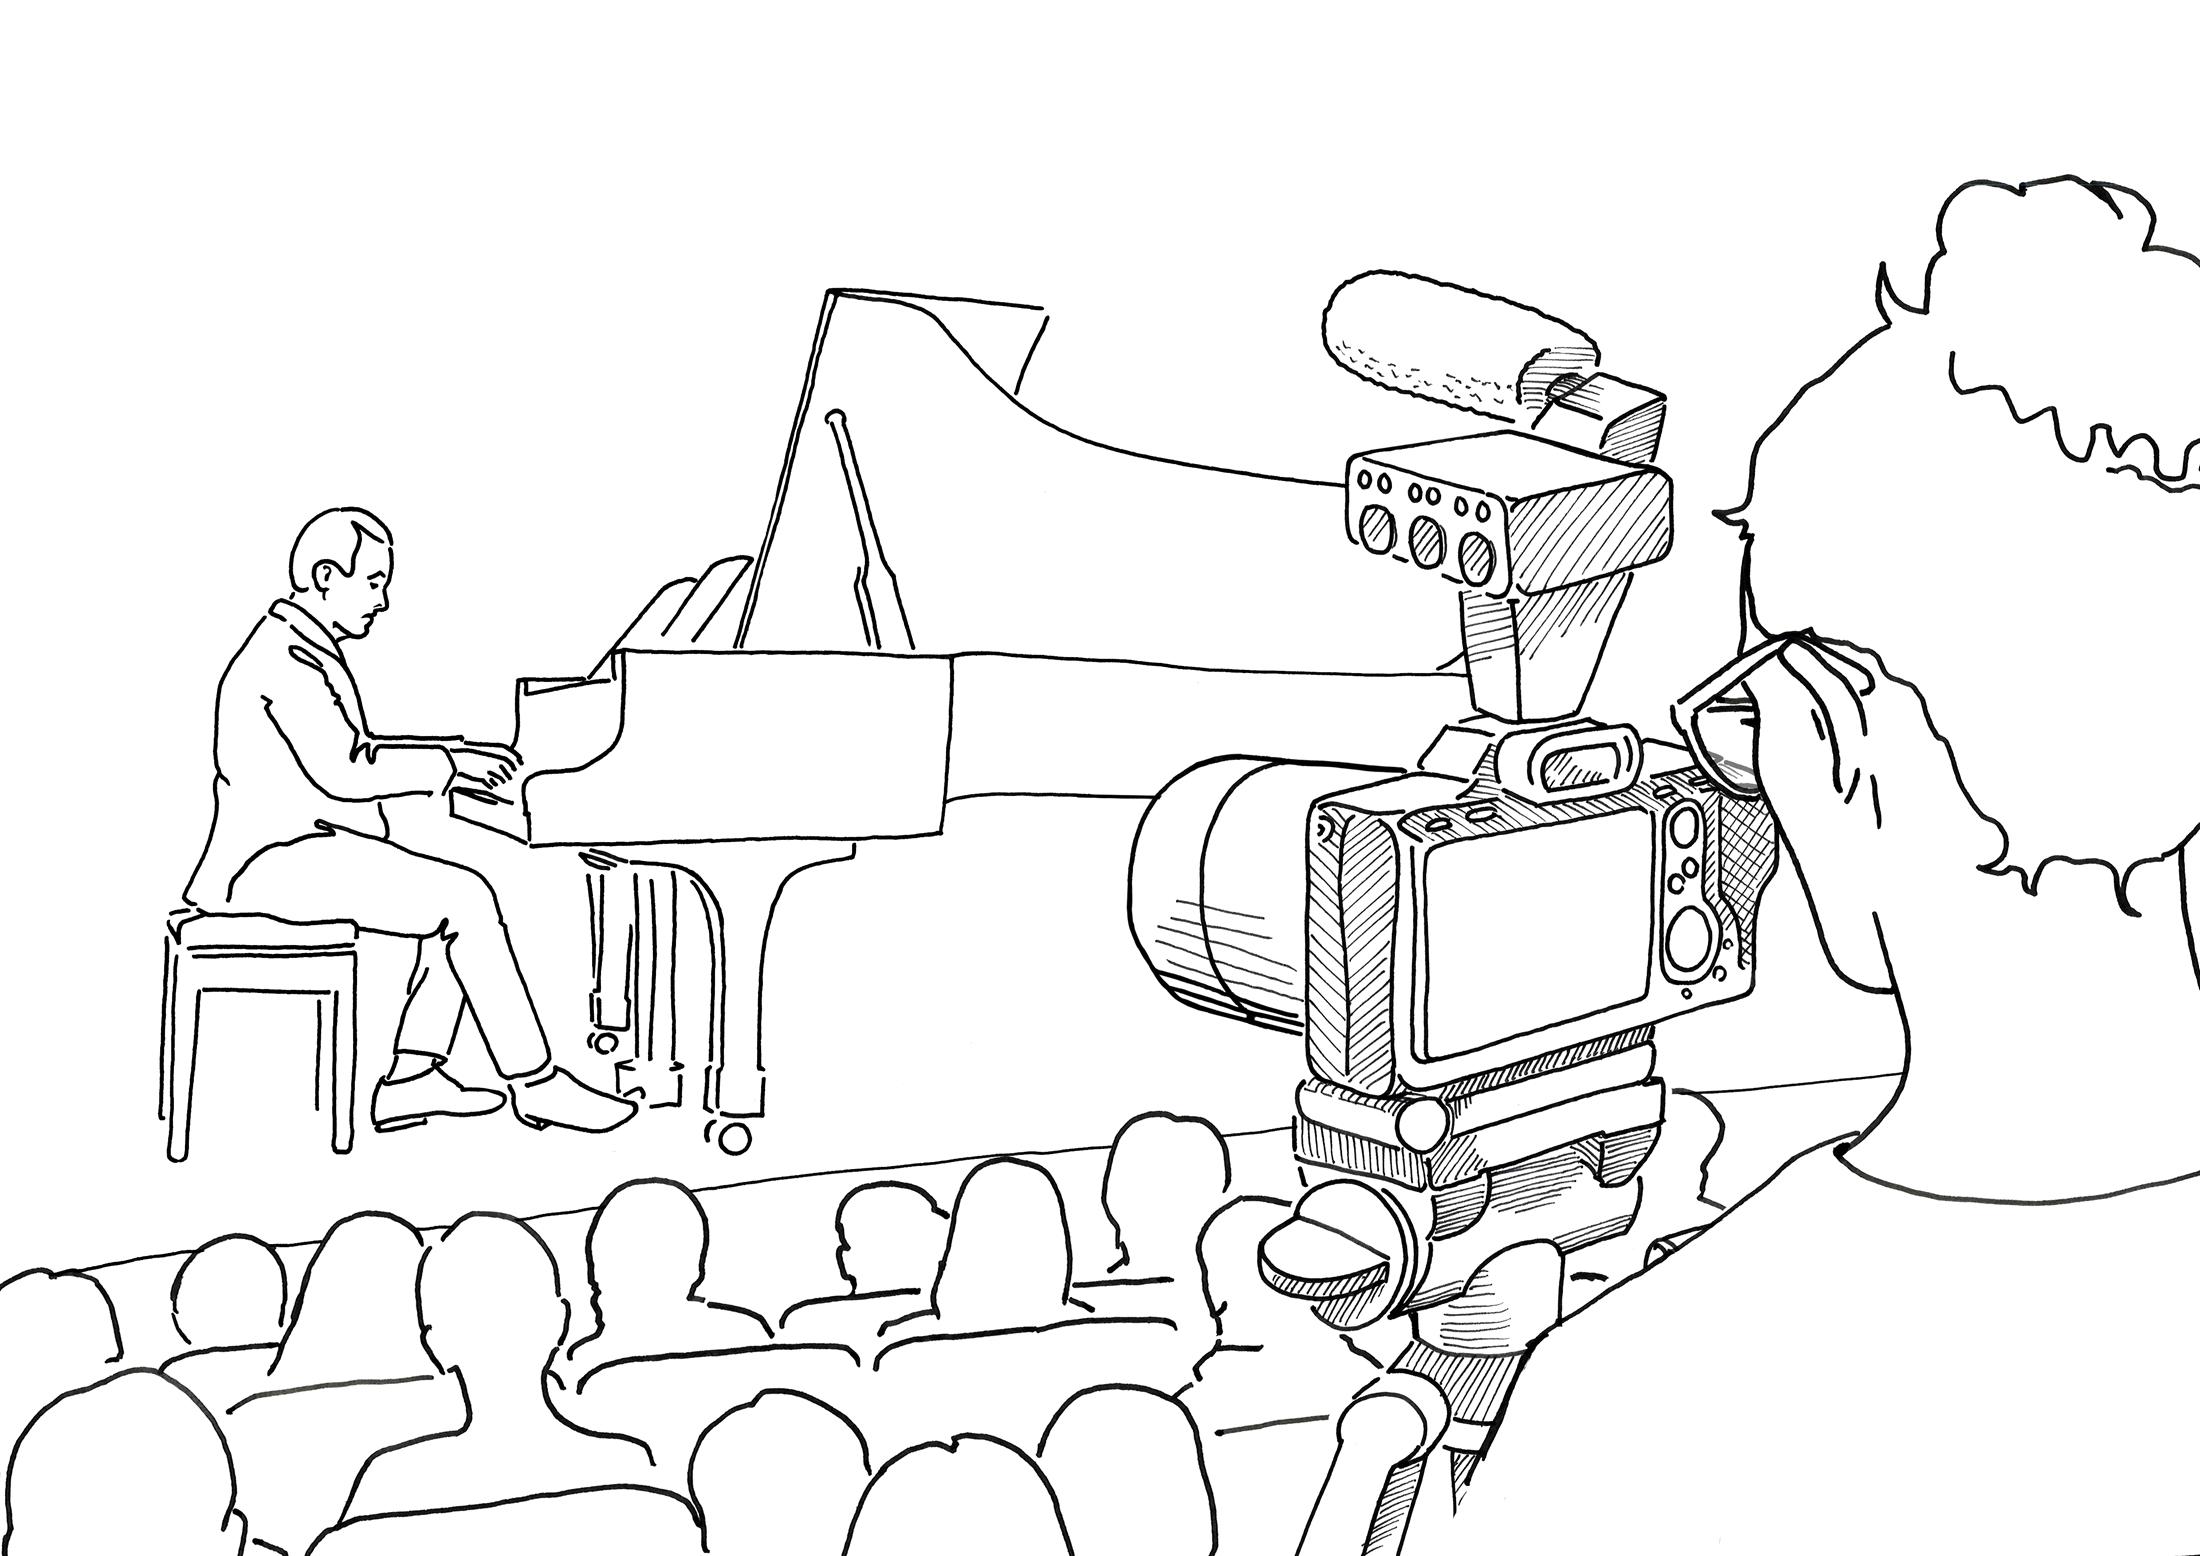 Illustration of Performance Setting